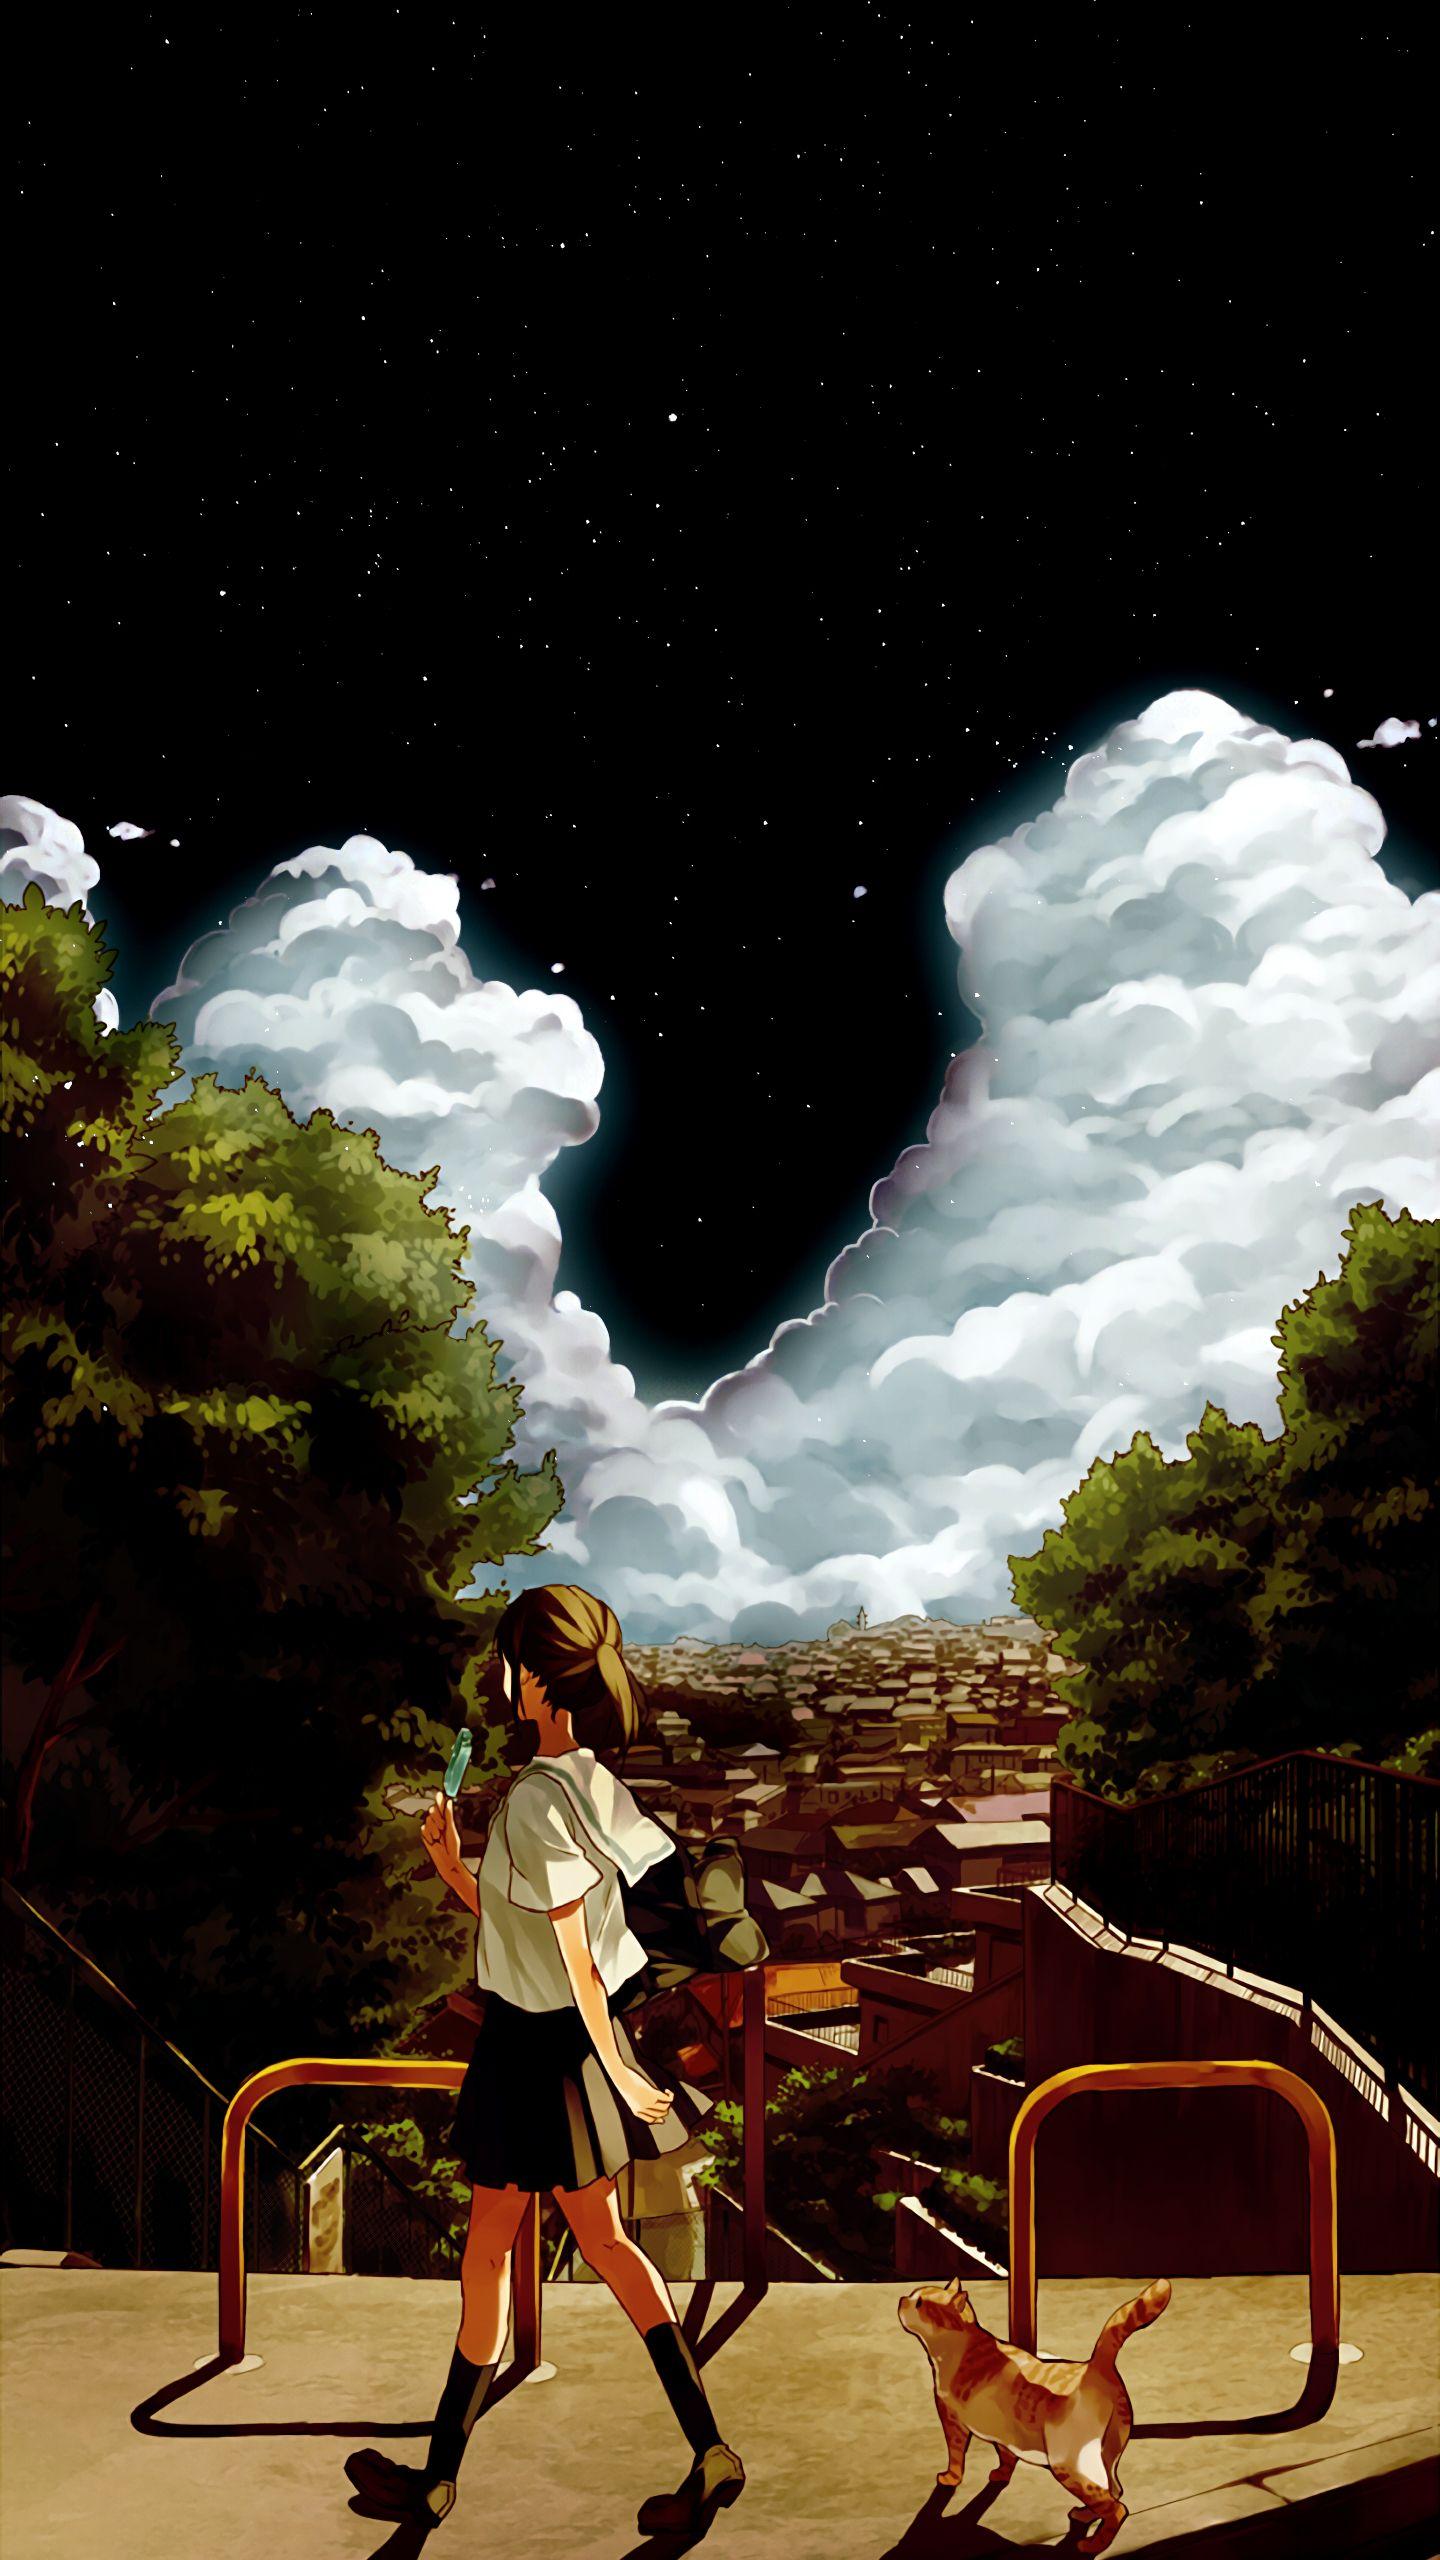 Amoled Anime Landscape Wallpaper Cloud Wallpaper Landscape Wallpaper Dark Wallpaper Desktop amoled anime wallpaper